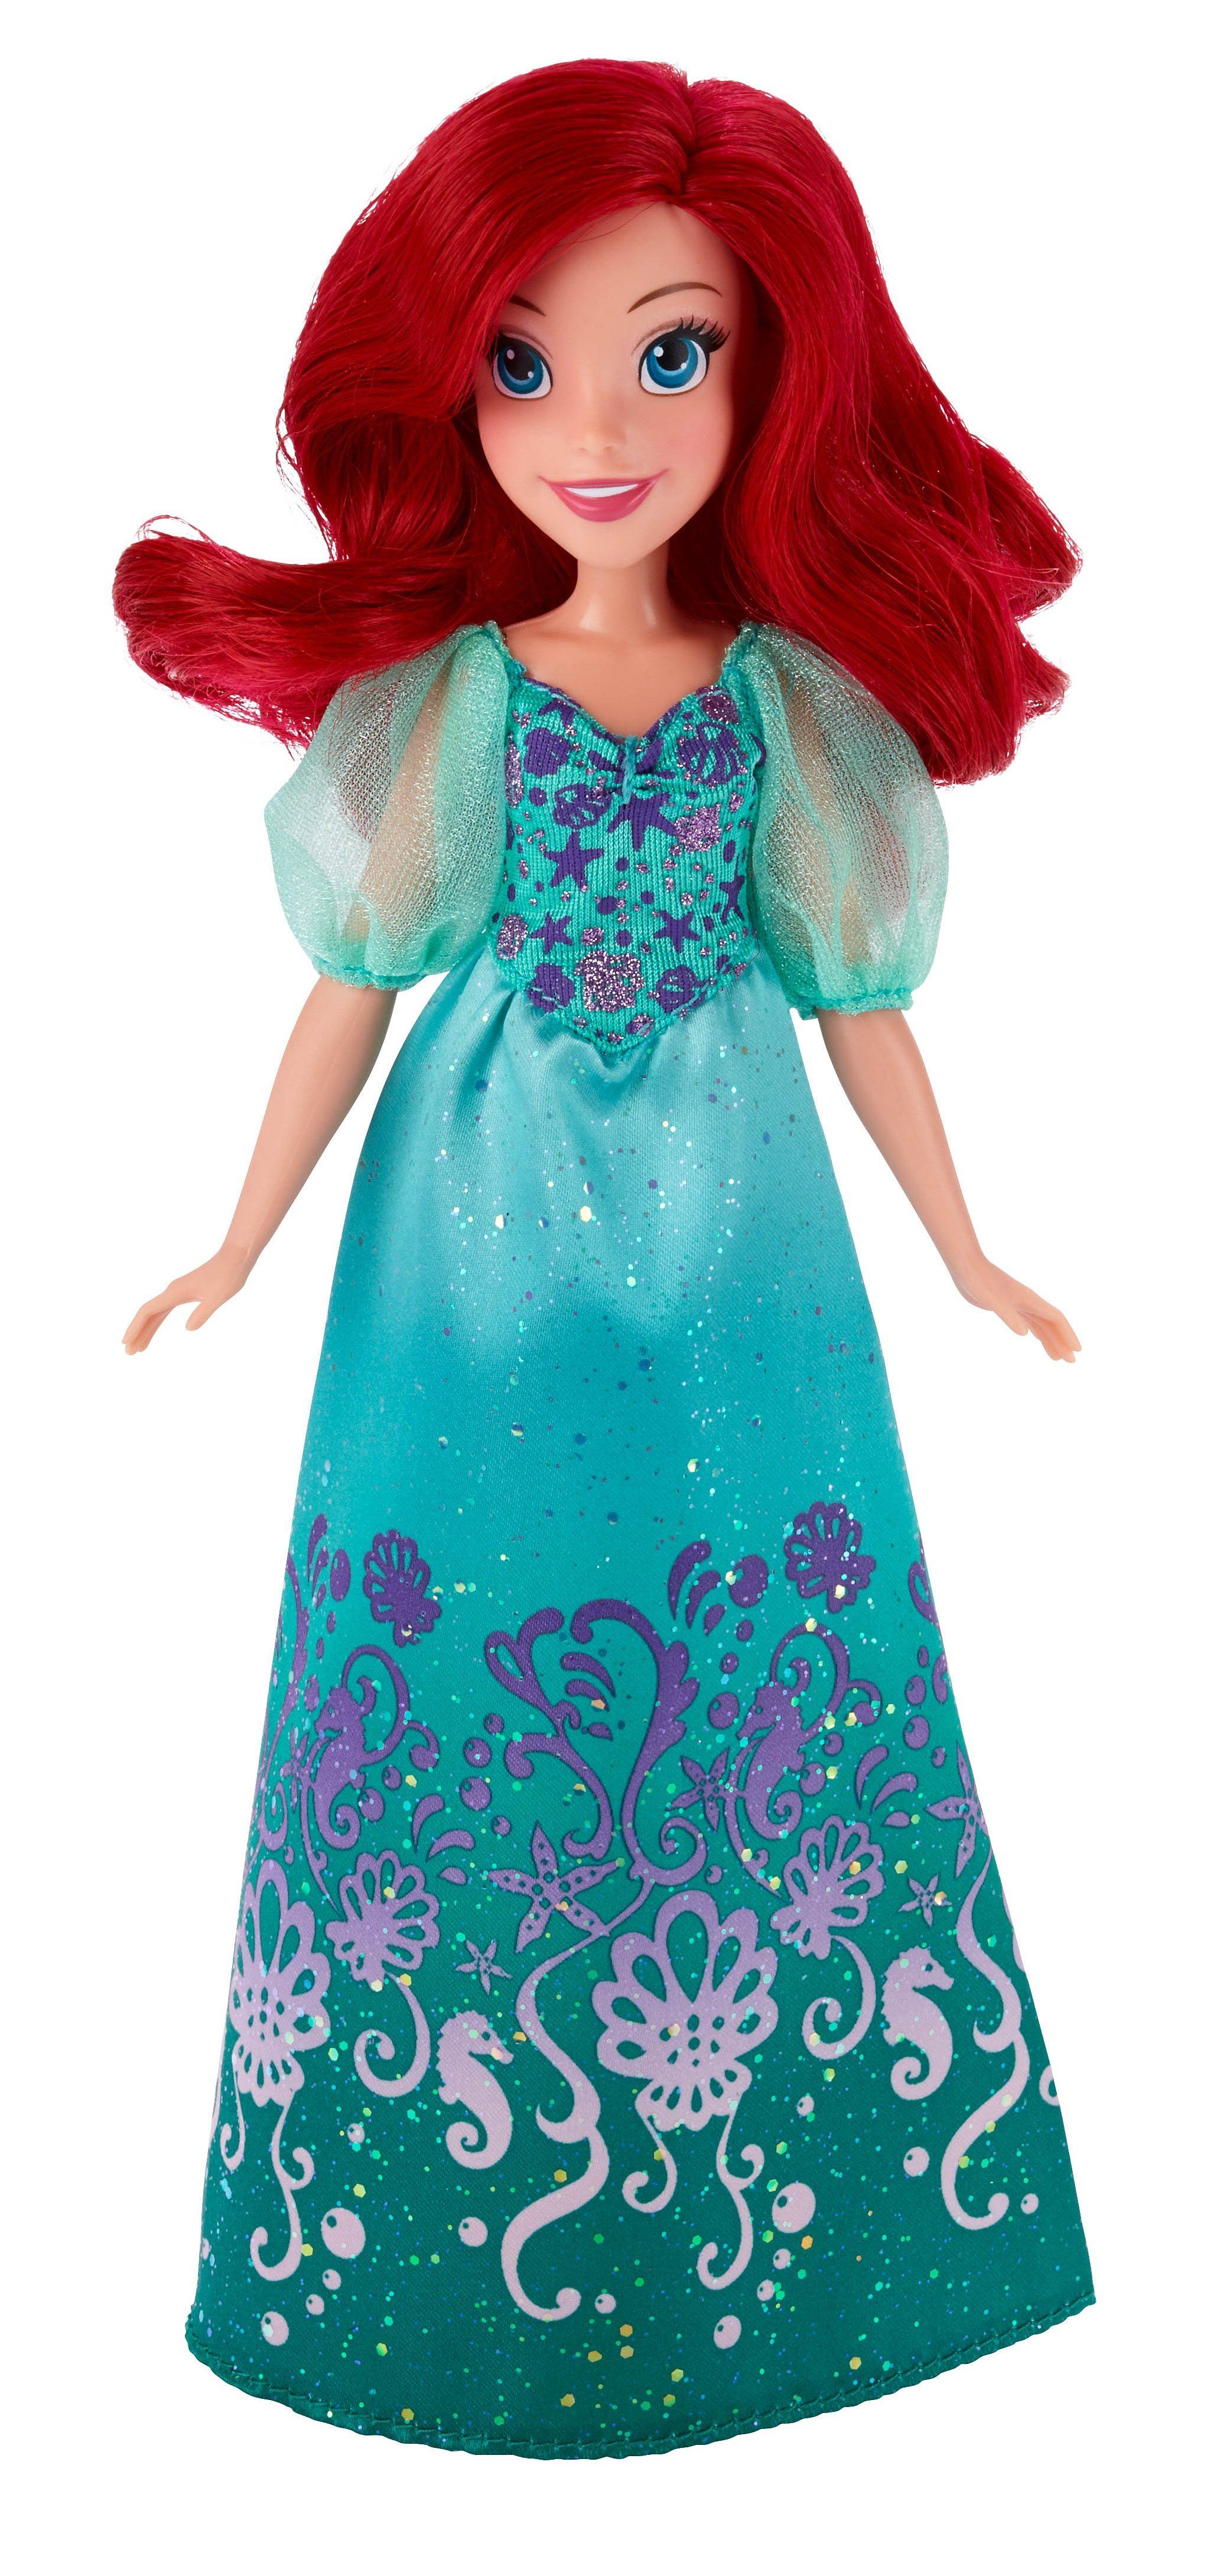 Hasbro Puppe 27 cm, »Disney Princess - Schimmerglanz Arielle«